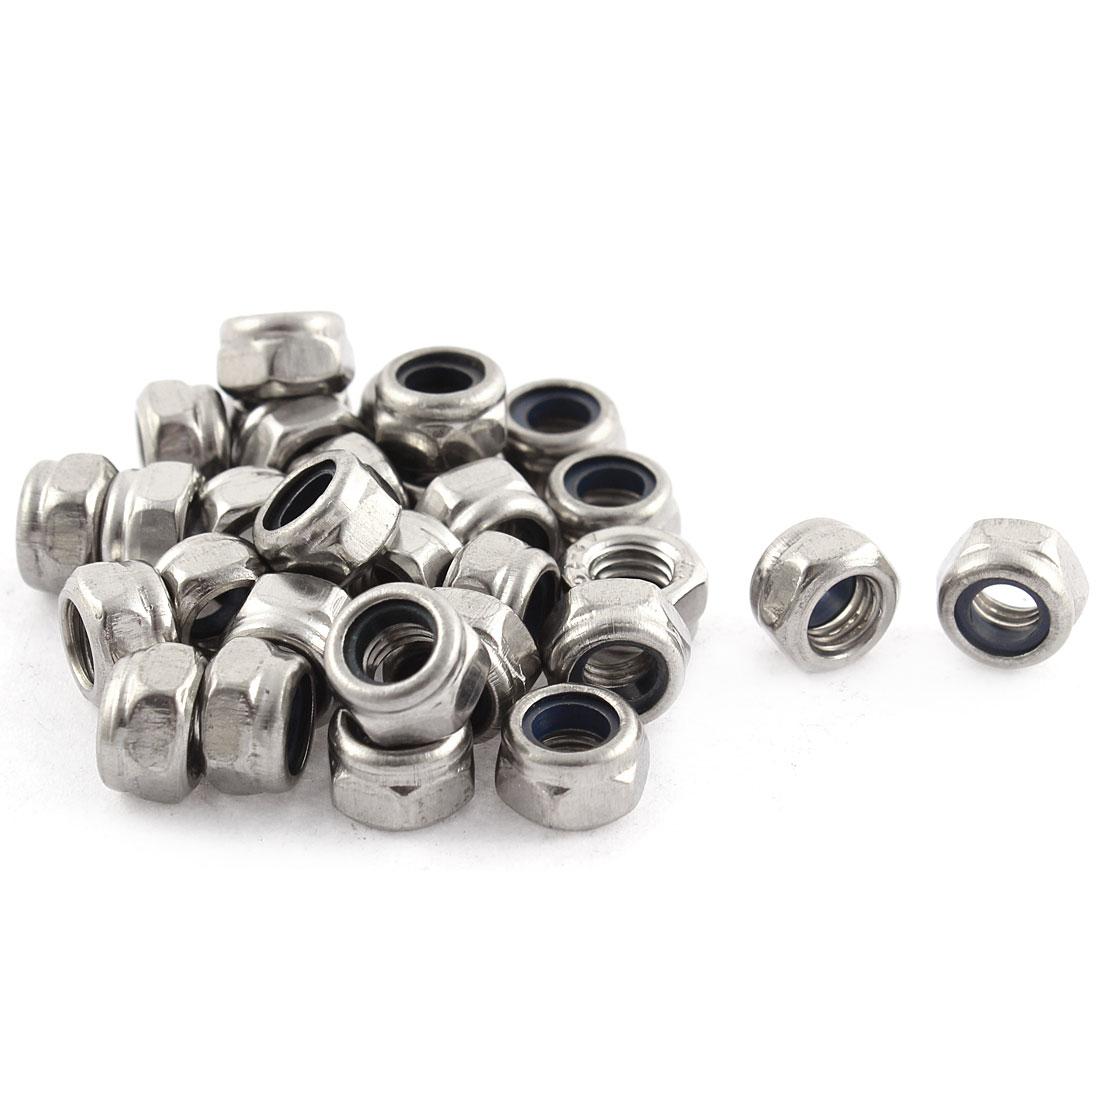 30 Pcs M5x0.8mm Metric Stainless Steel Nylon Insert Lock Hex Nuts